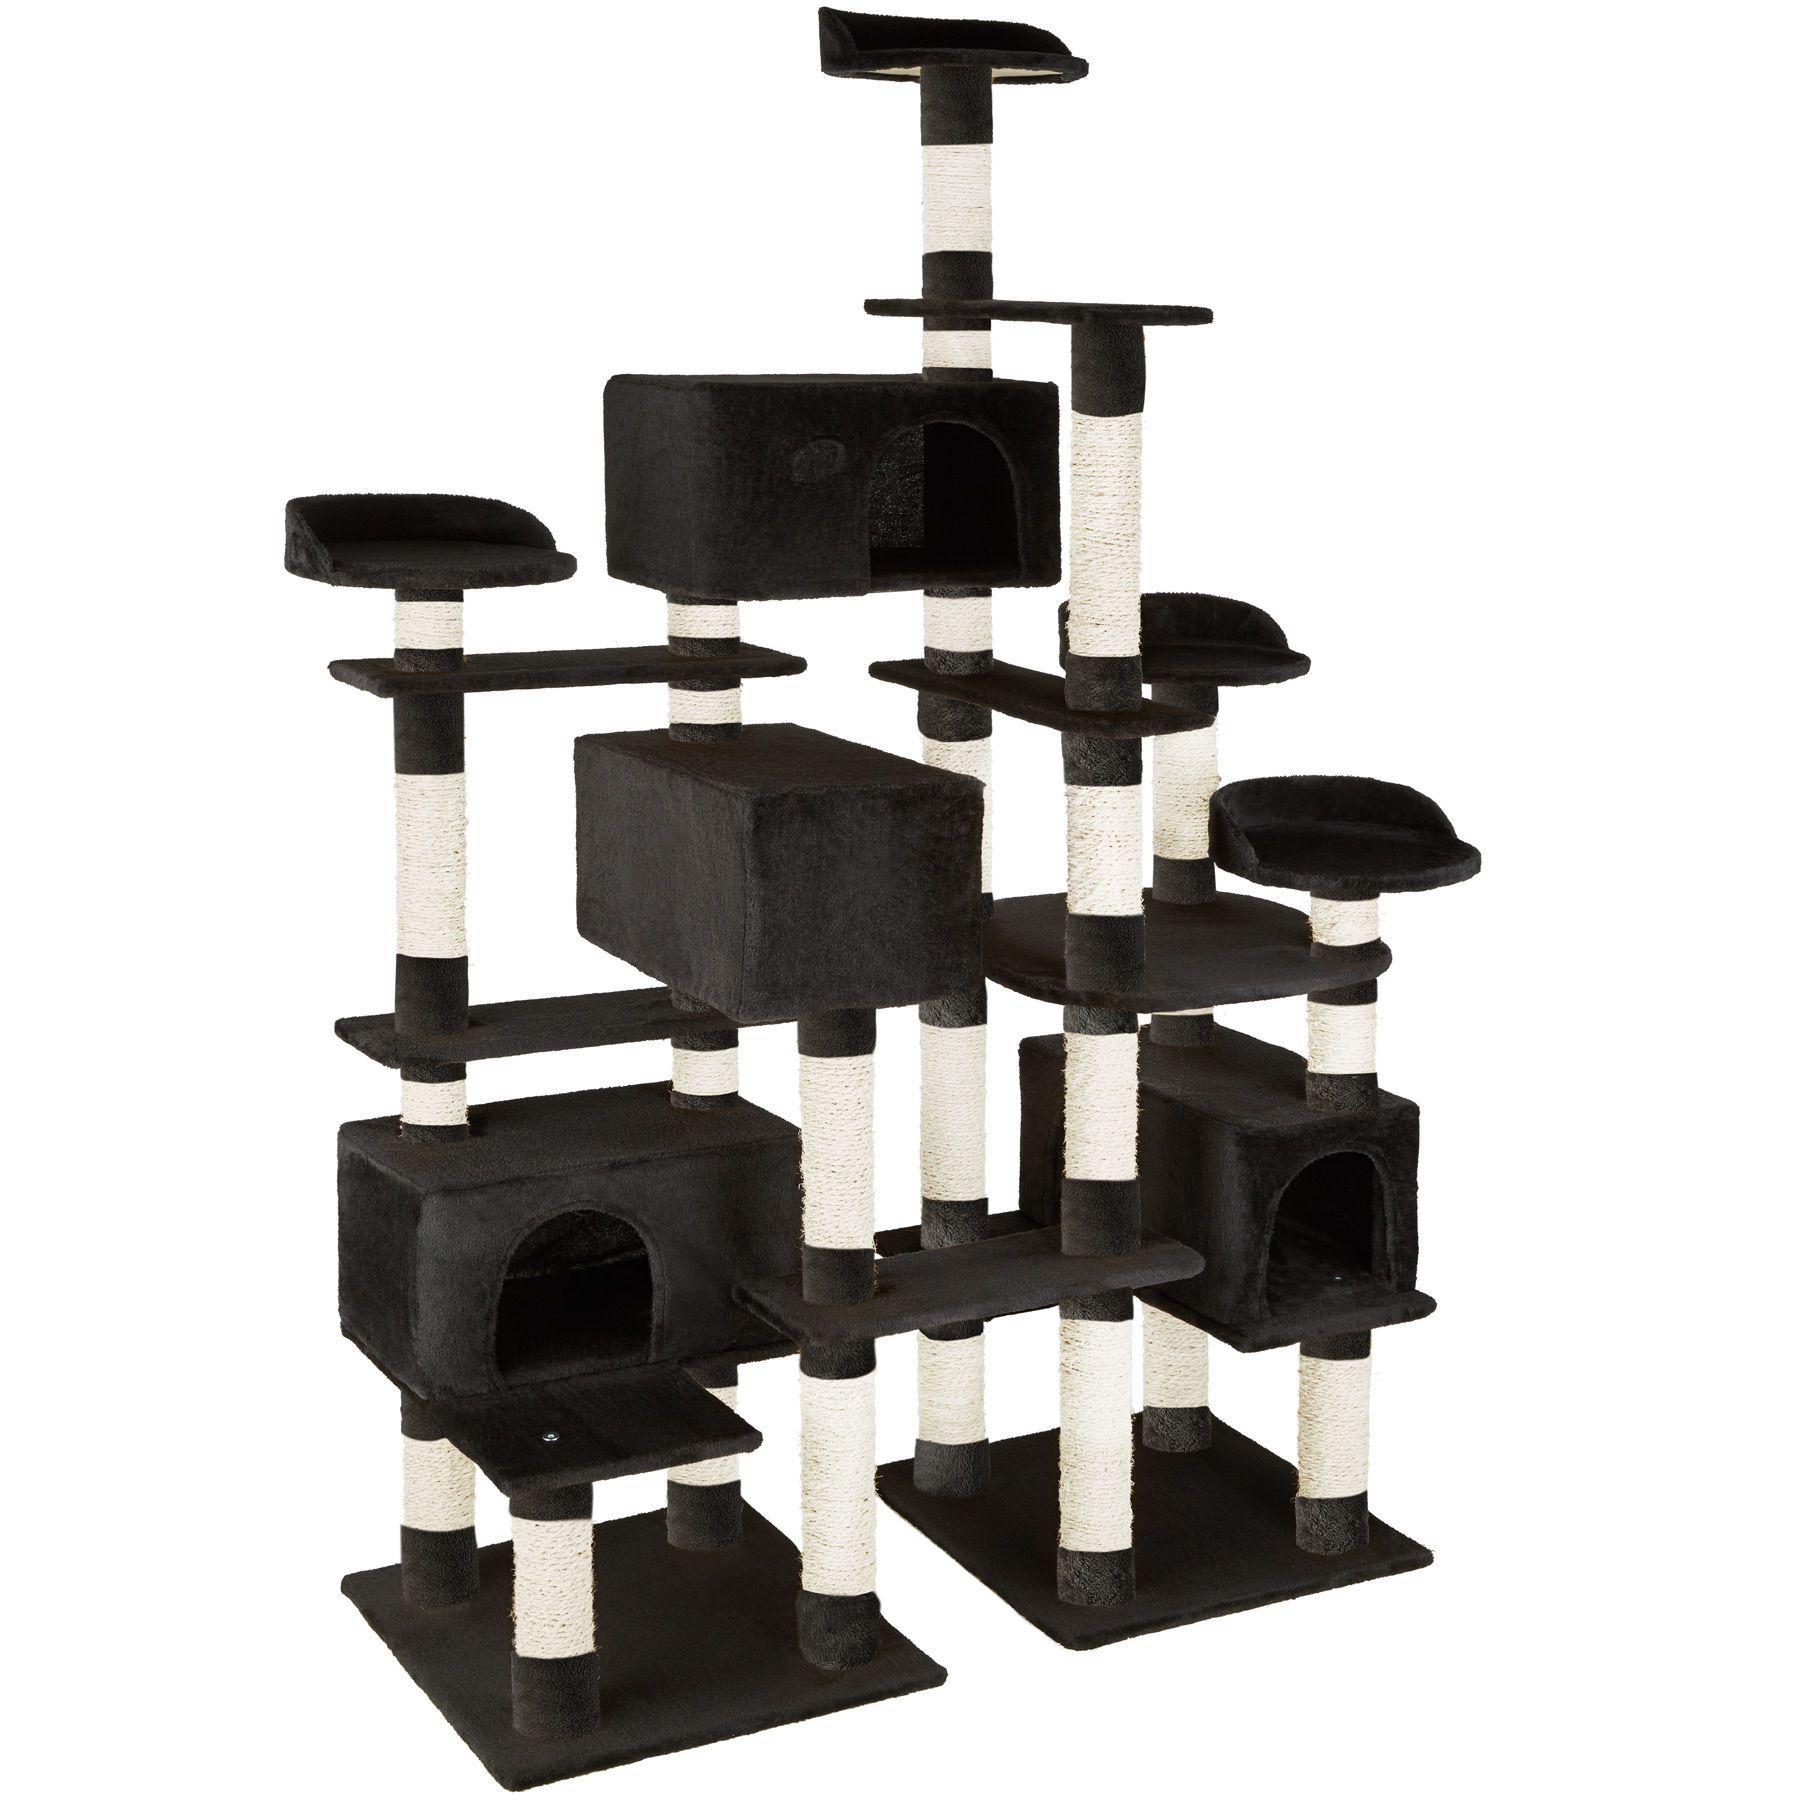 xxl kratzbaum baum f r katzen kletterbaum katzenbaum katzenkratzbaum 214cm ebay. Black Bedroom Furniture Sets. Home Design Ideas